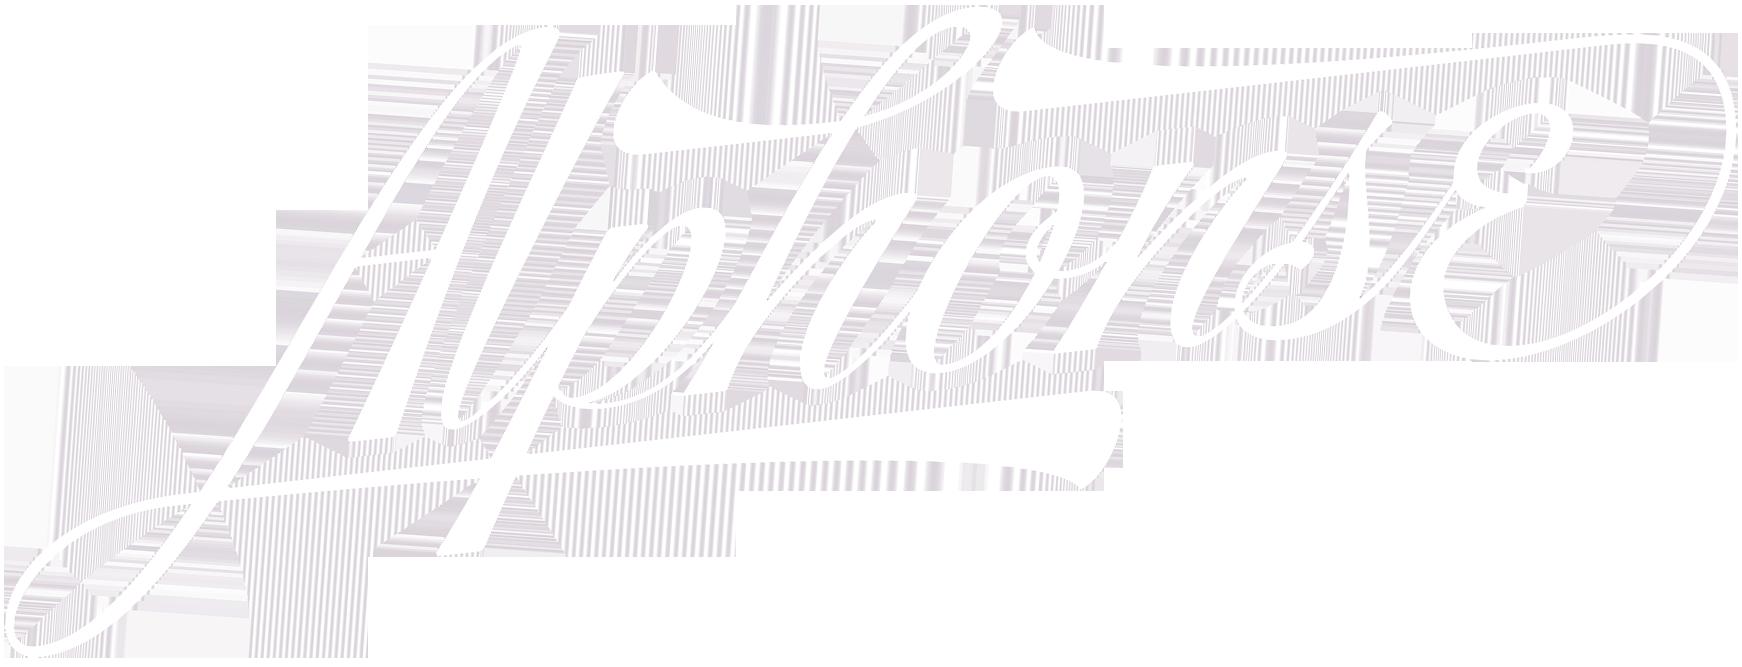 (Français) Studio Alphonse